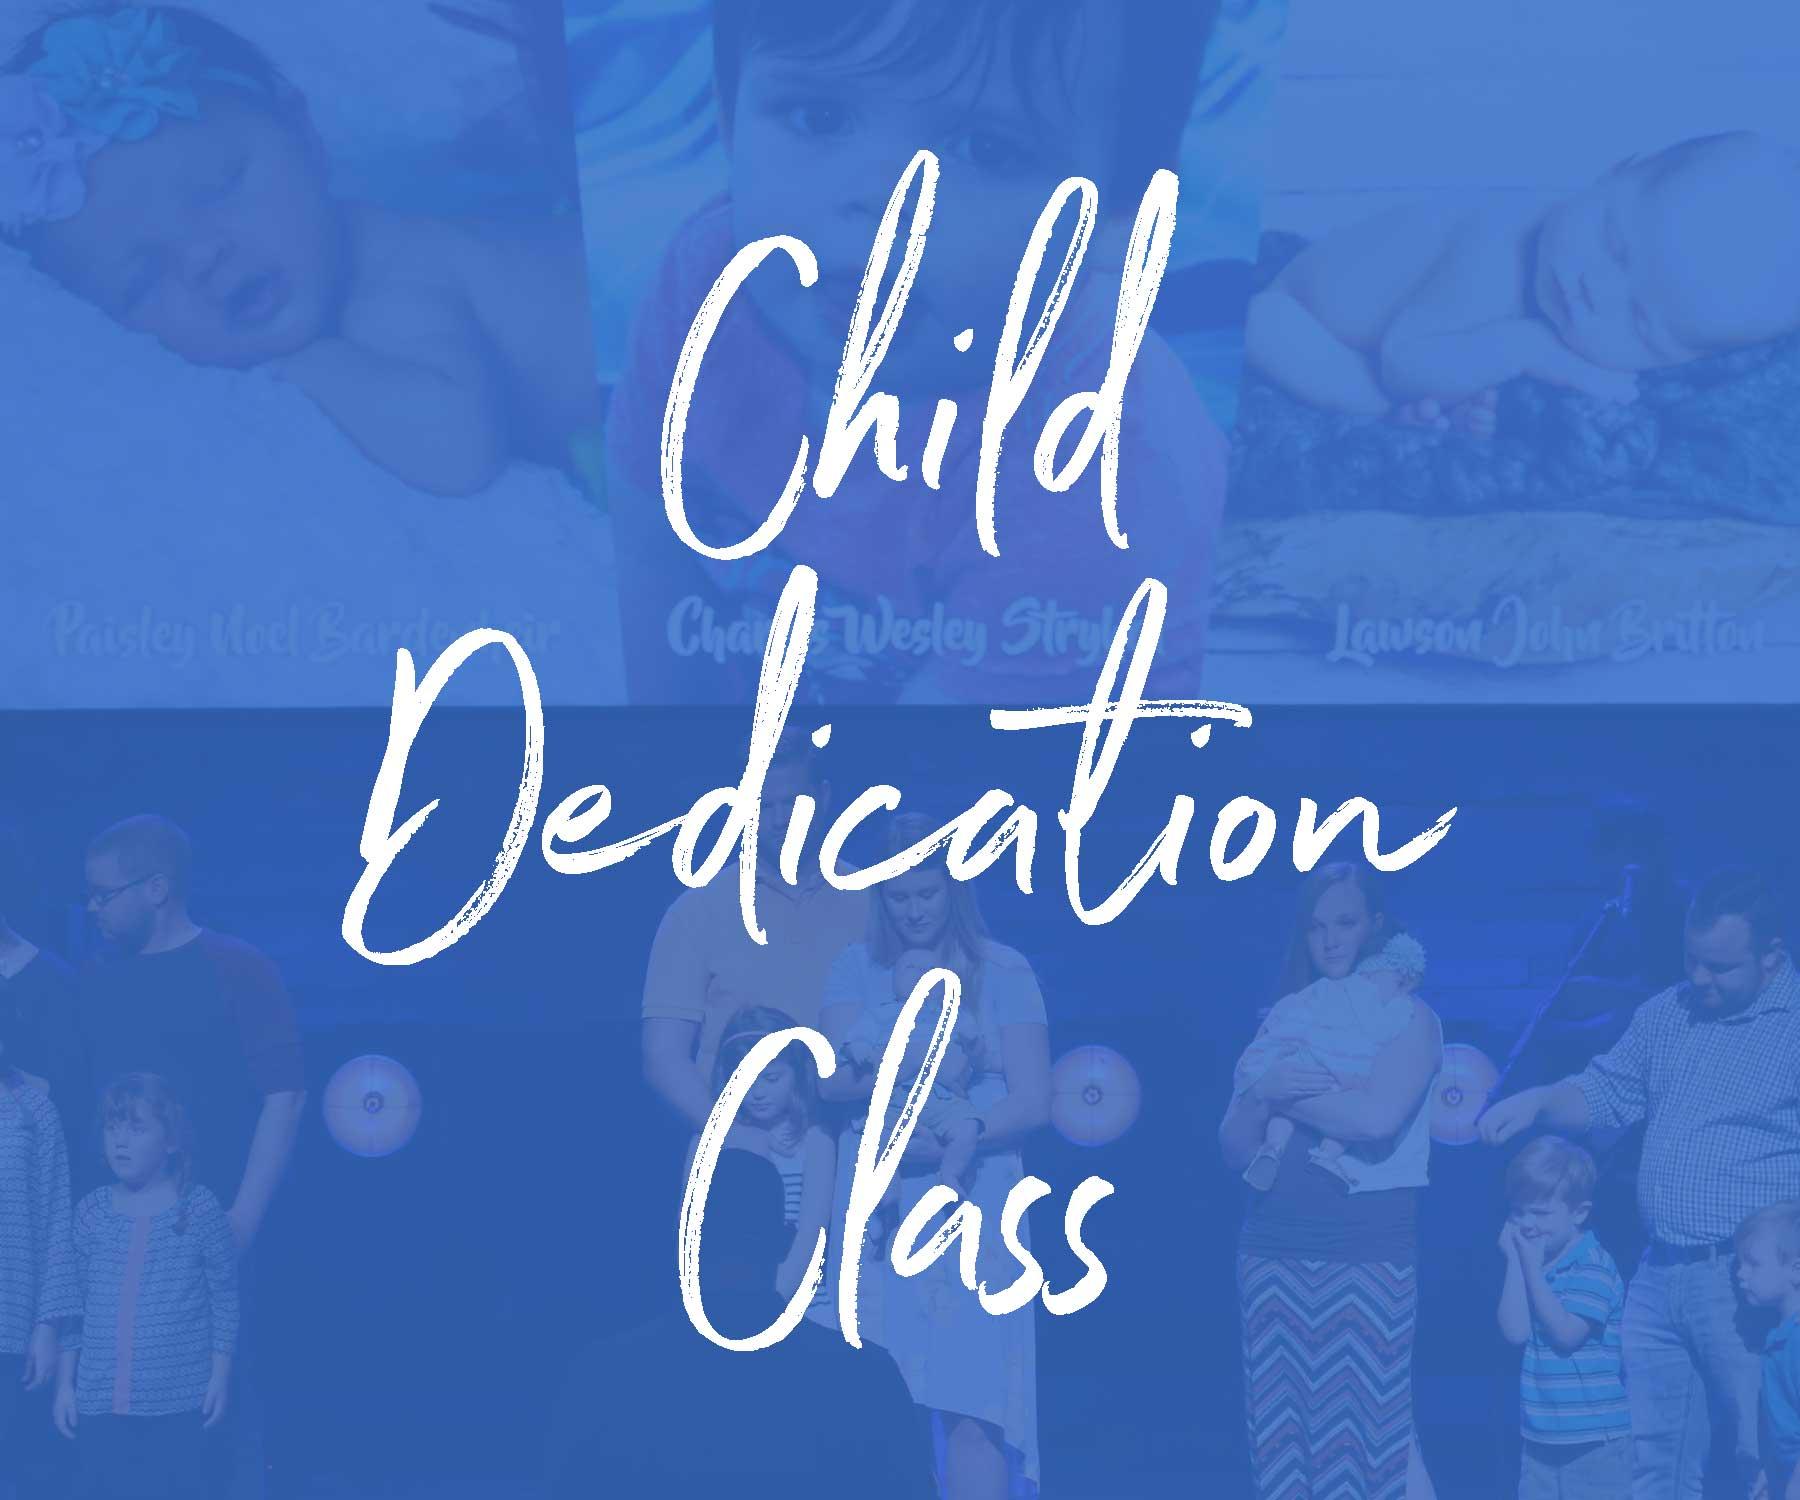 Child dedication class 2